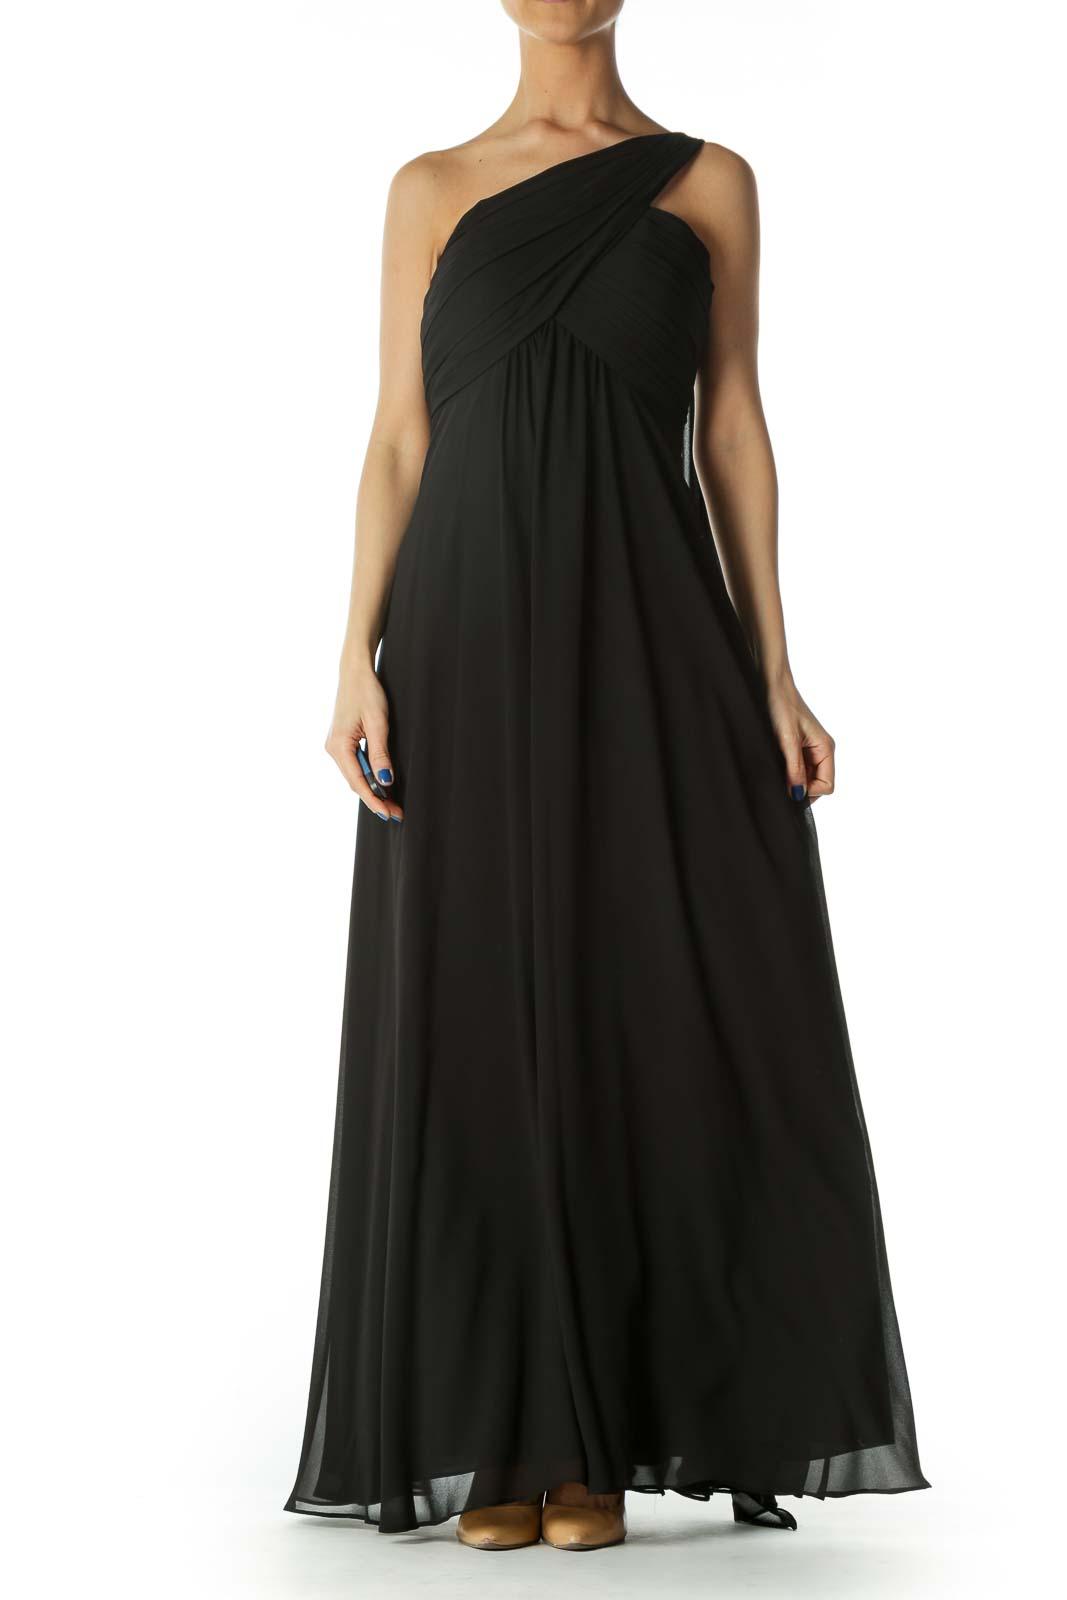 Black One Shoulder Evening Gown